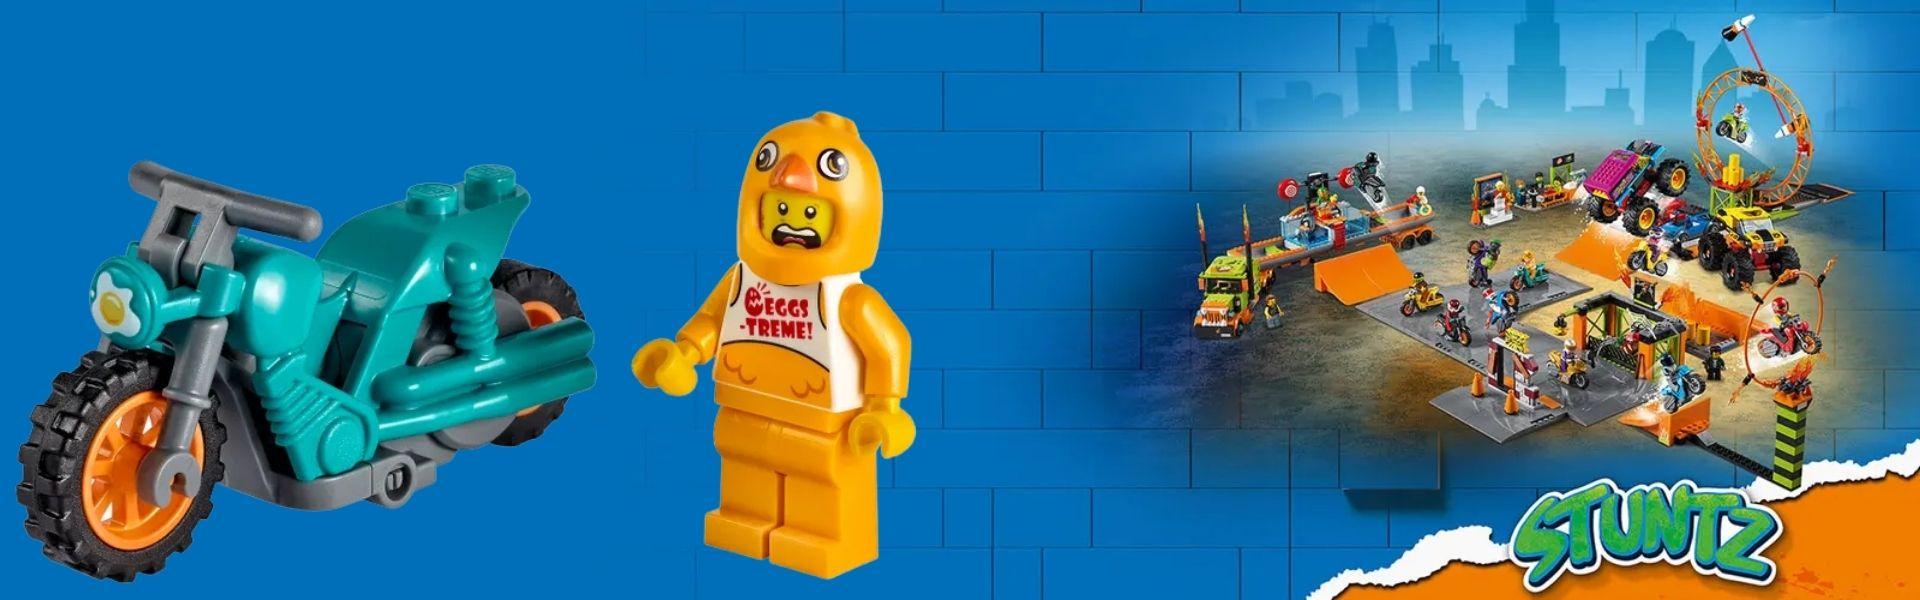 LEGO City Stuntz